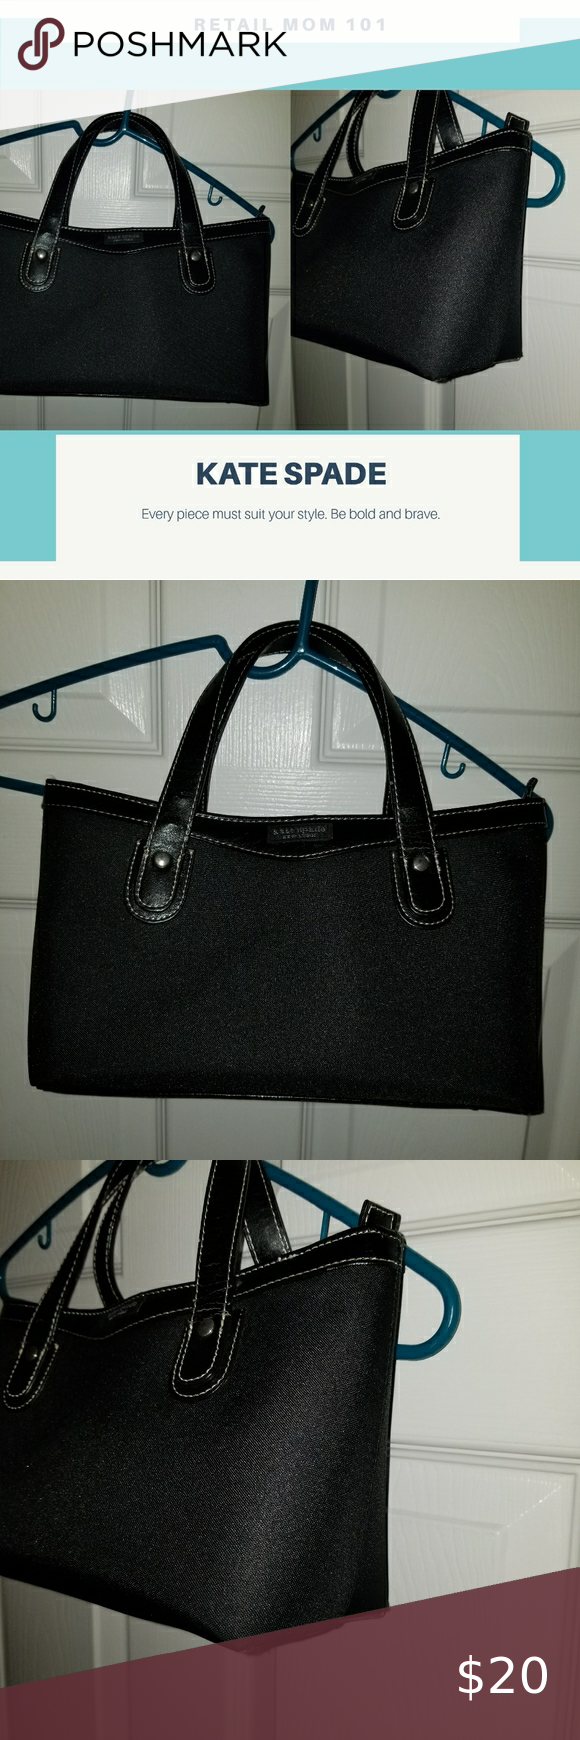 Coccinelle Madelaine Handbag Grained Cow Leather Black E1eka180101 001 Wardow Com Black Handbags Cow Leather Handbag